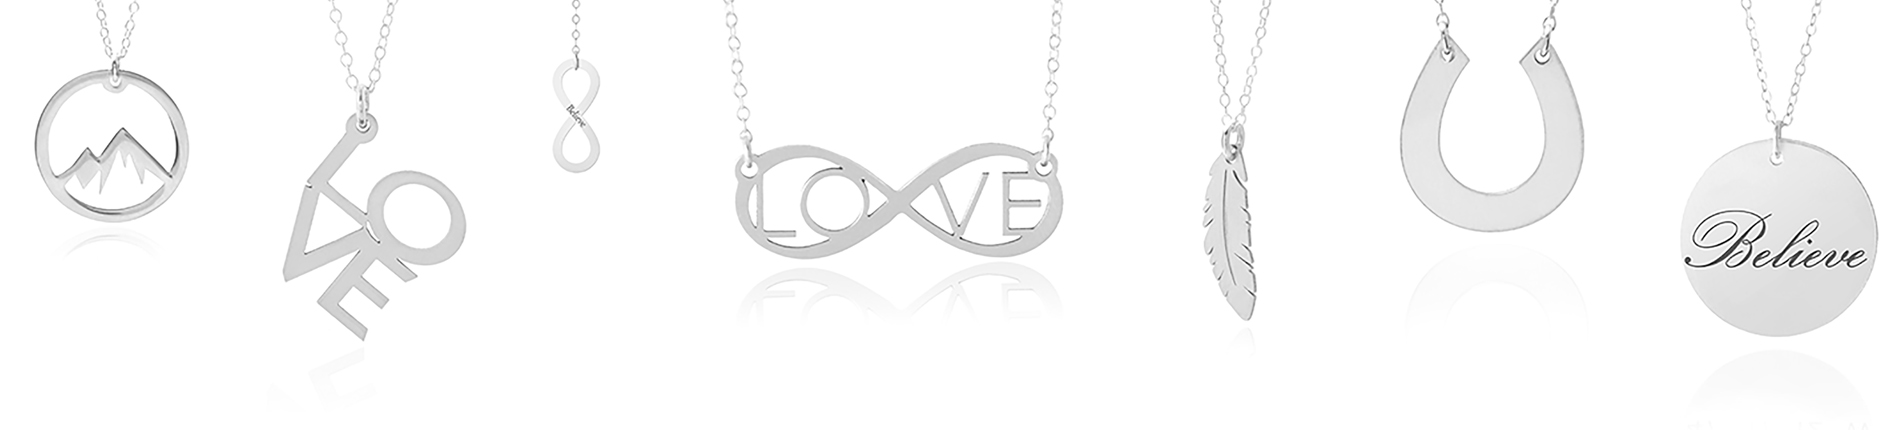 Necklaces influenceco